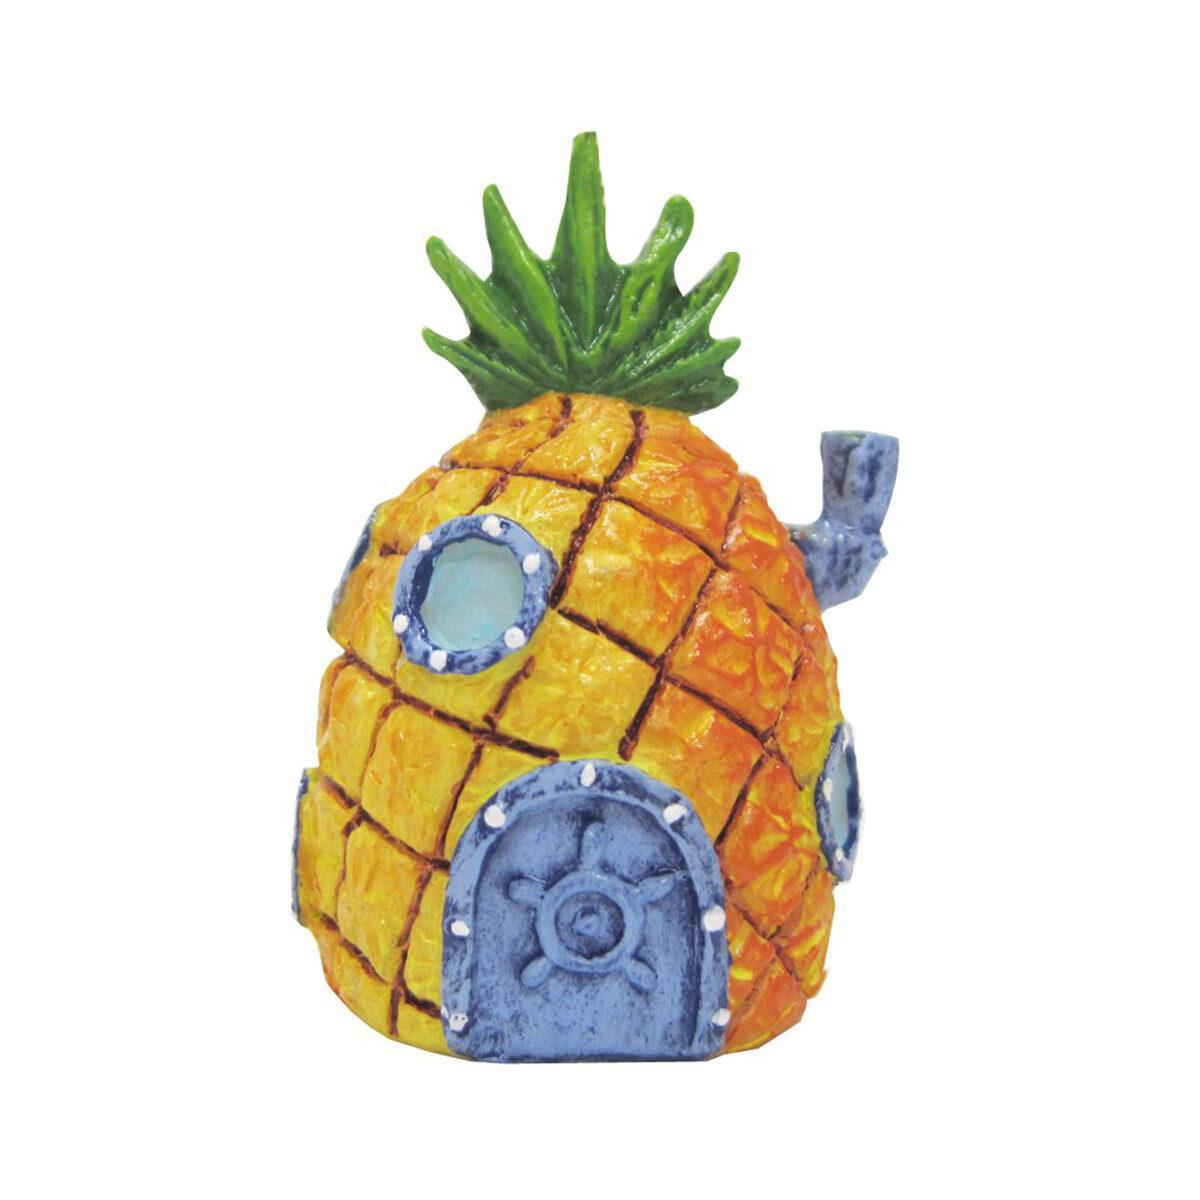 Penn Plax Ornamenten Spongebob - Ananas-Huis 14cm - in Decoratie